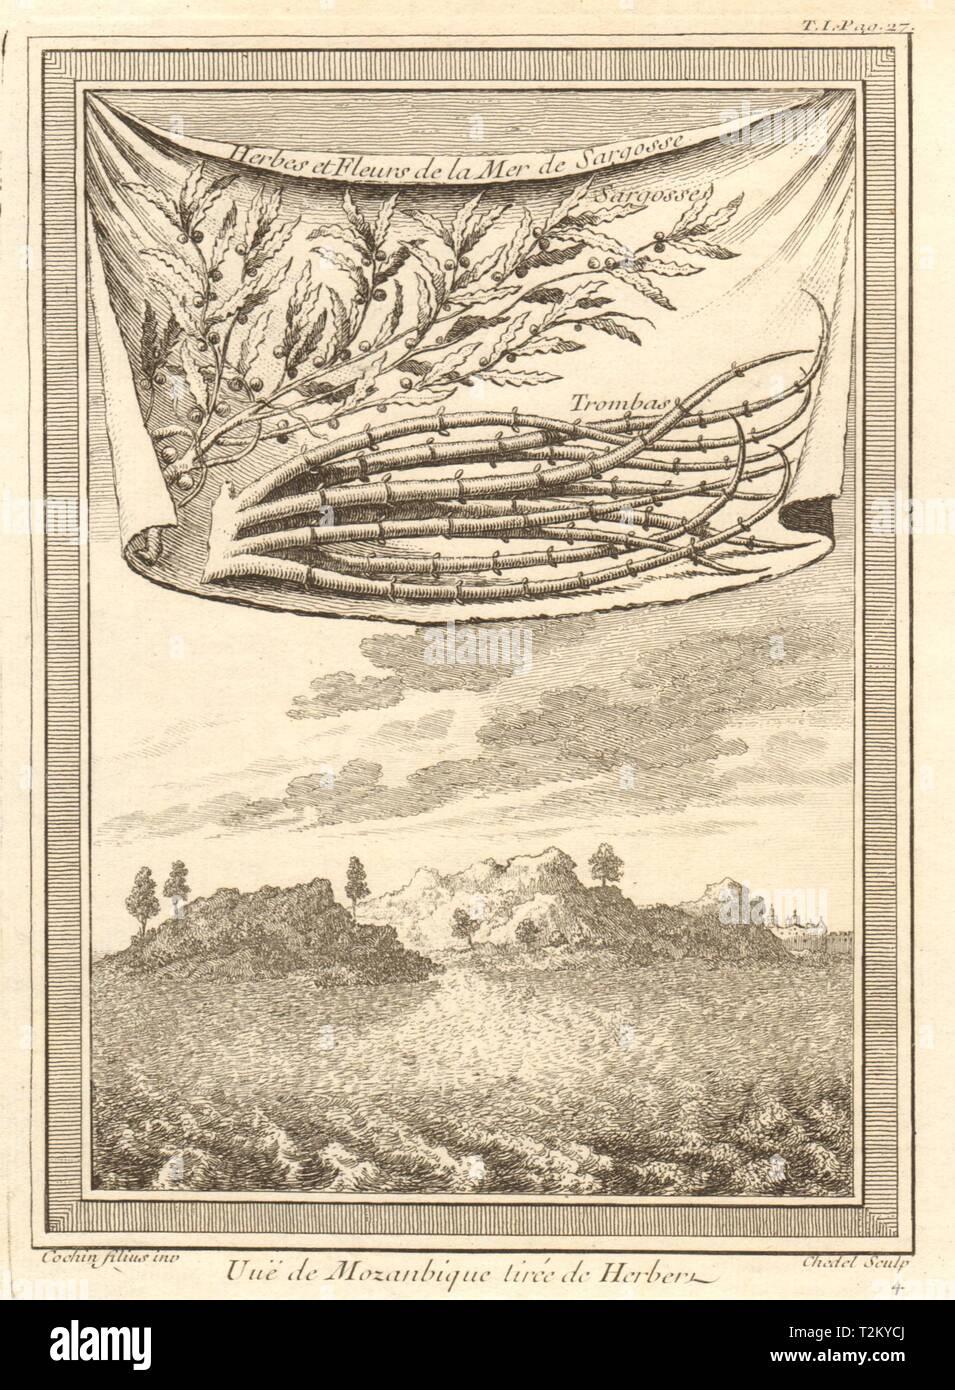 'Vue de Mozanbique'. Mozambique island, from Herbert. Sargassum seaweed 1746 - Stock Image